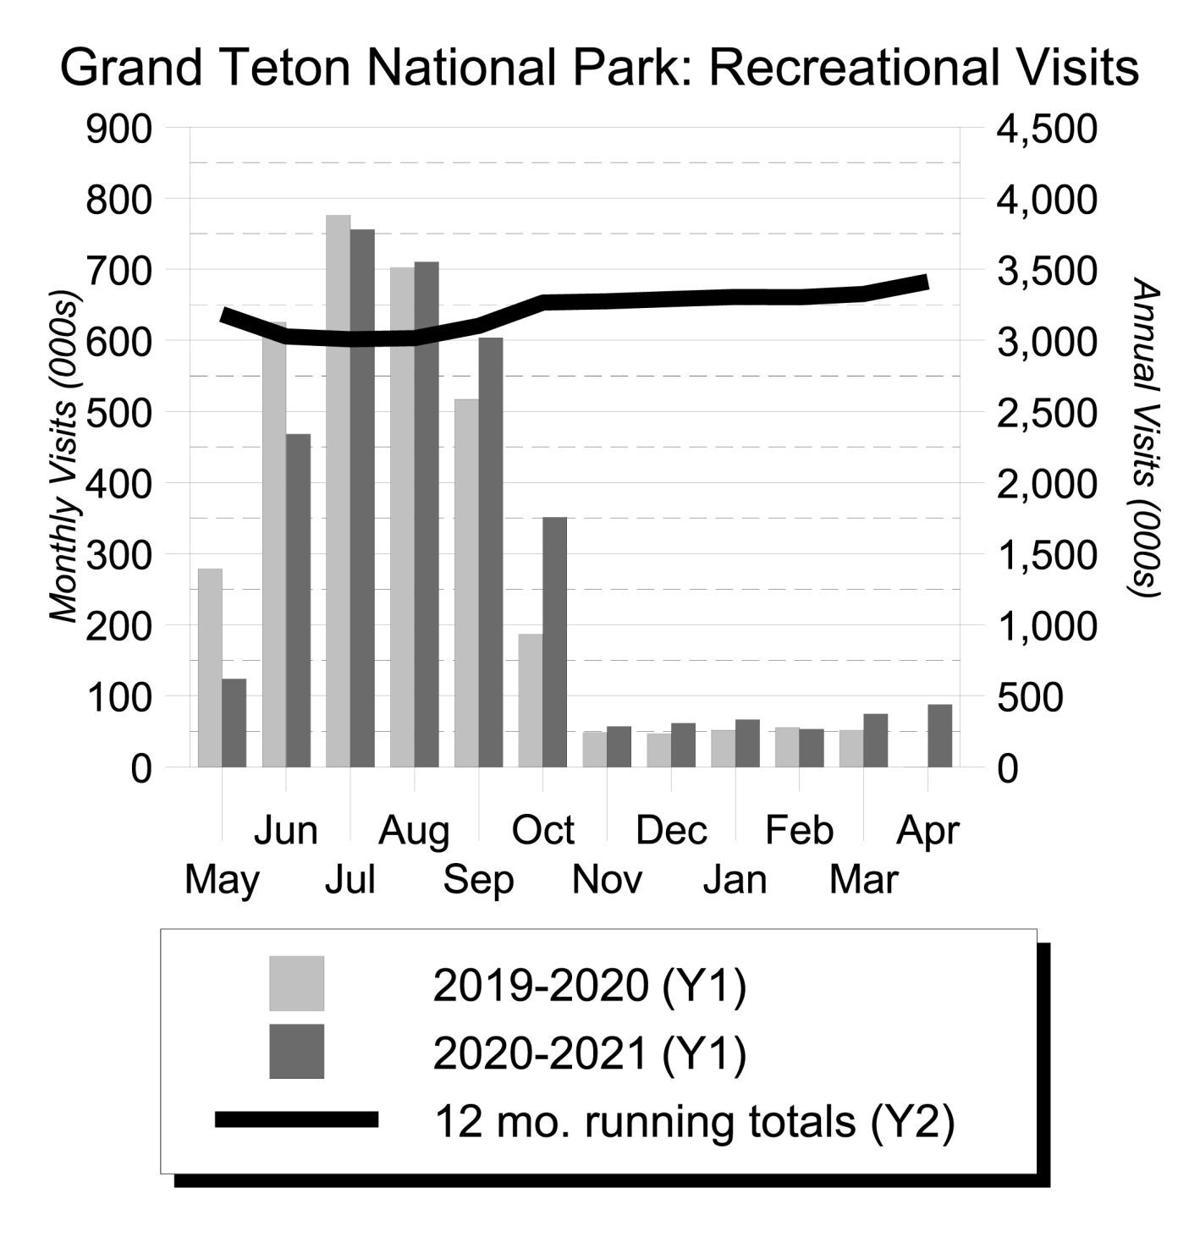 Grand Teton National Park - Recreational Visits